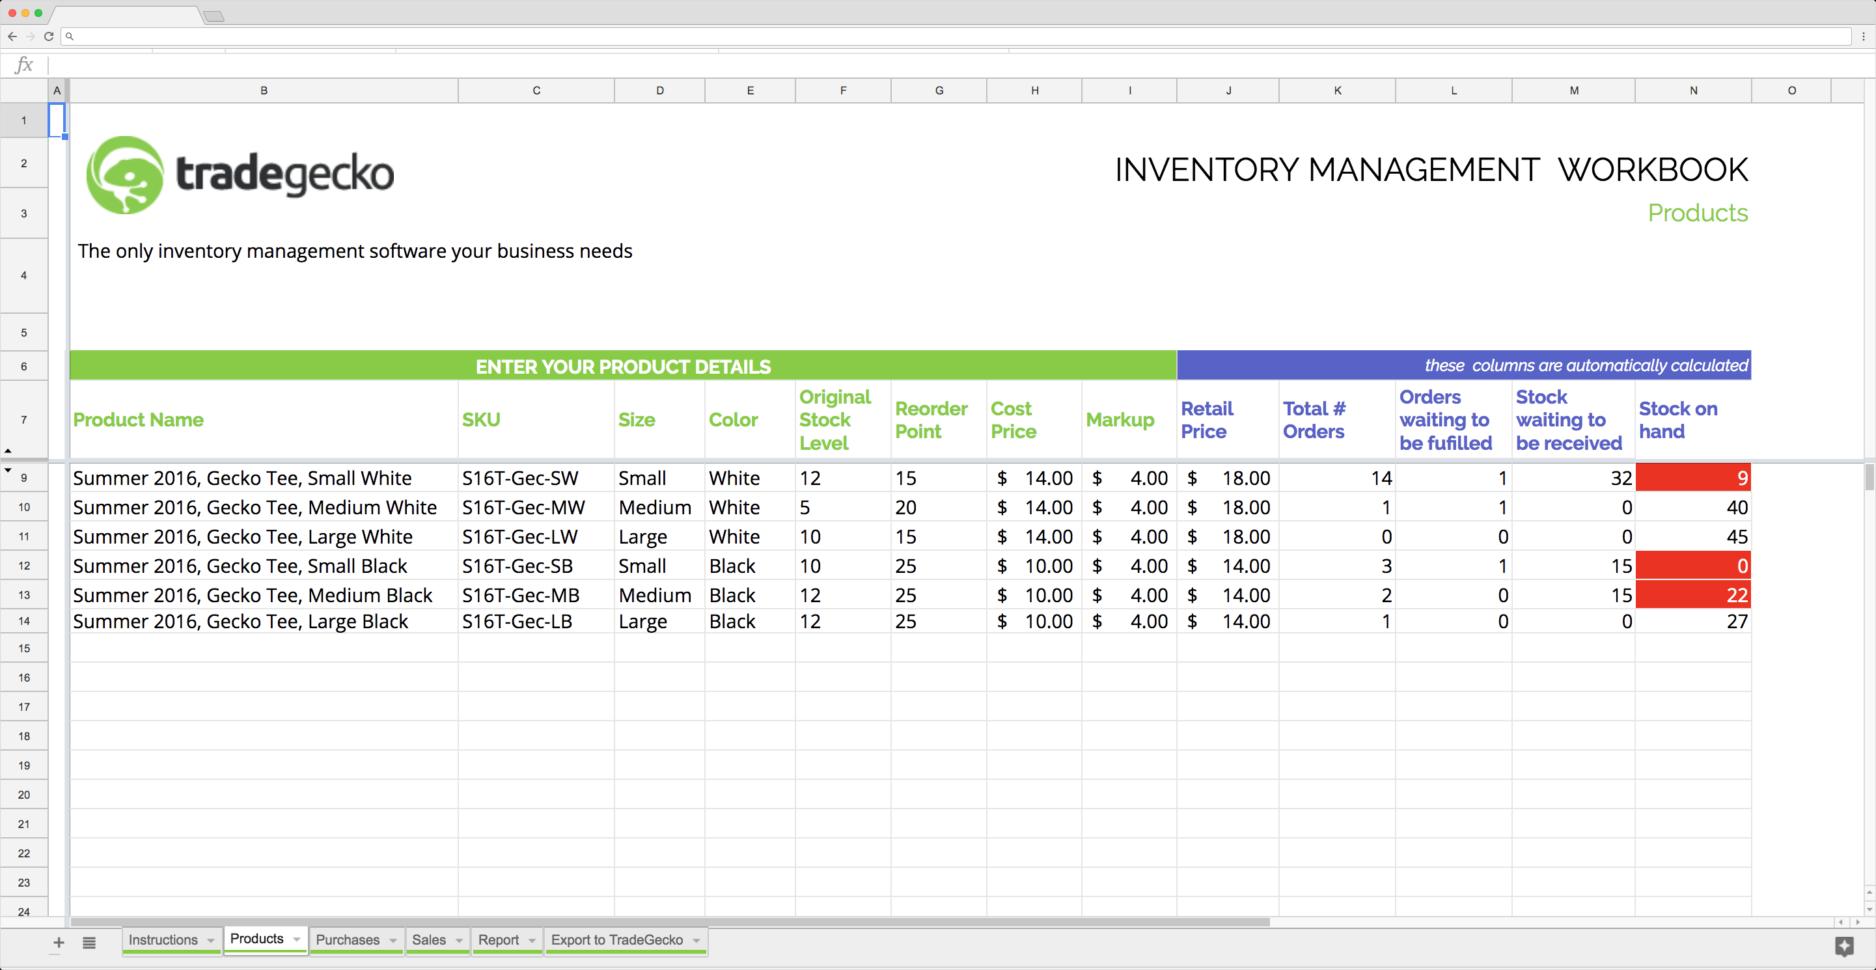 Free Inventory Spreadsheet Template Google Sheets With Top 5 Free Google Sheets Inventory Templates · Blog Sheetgo